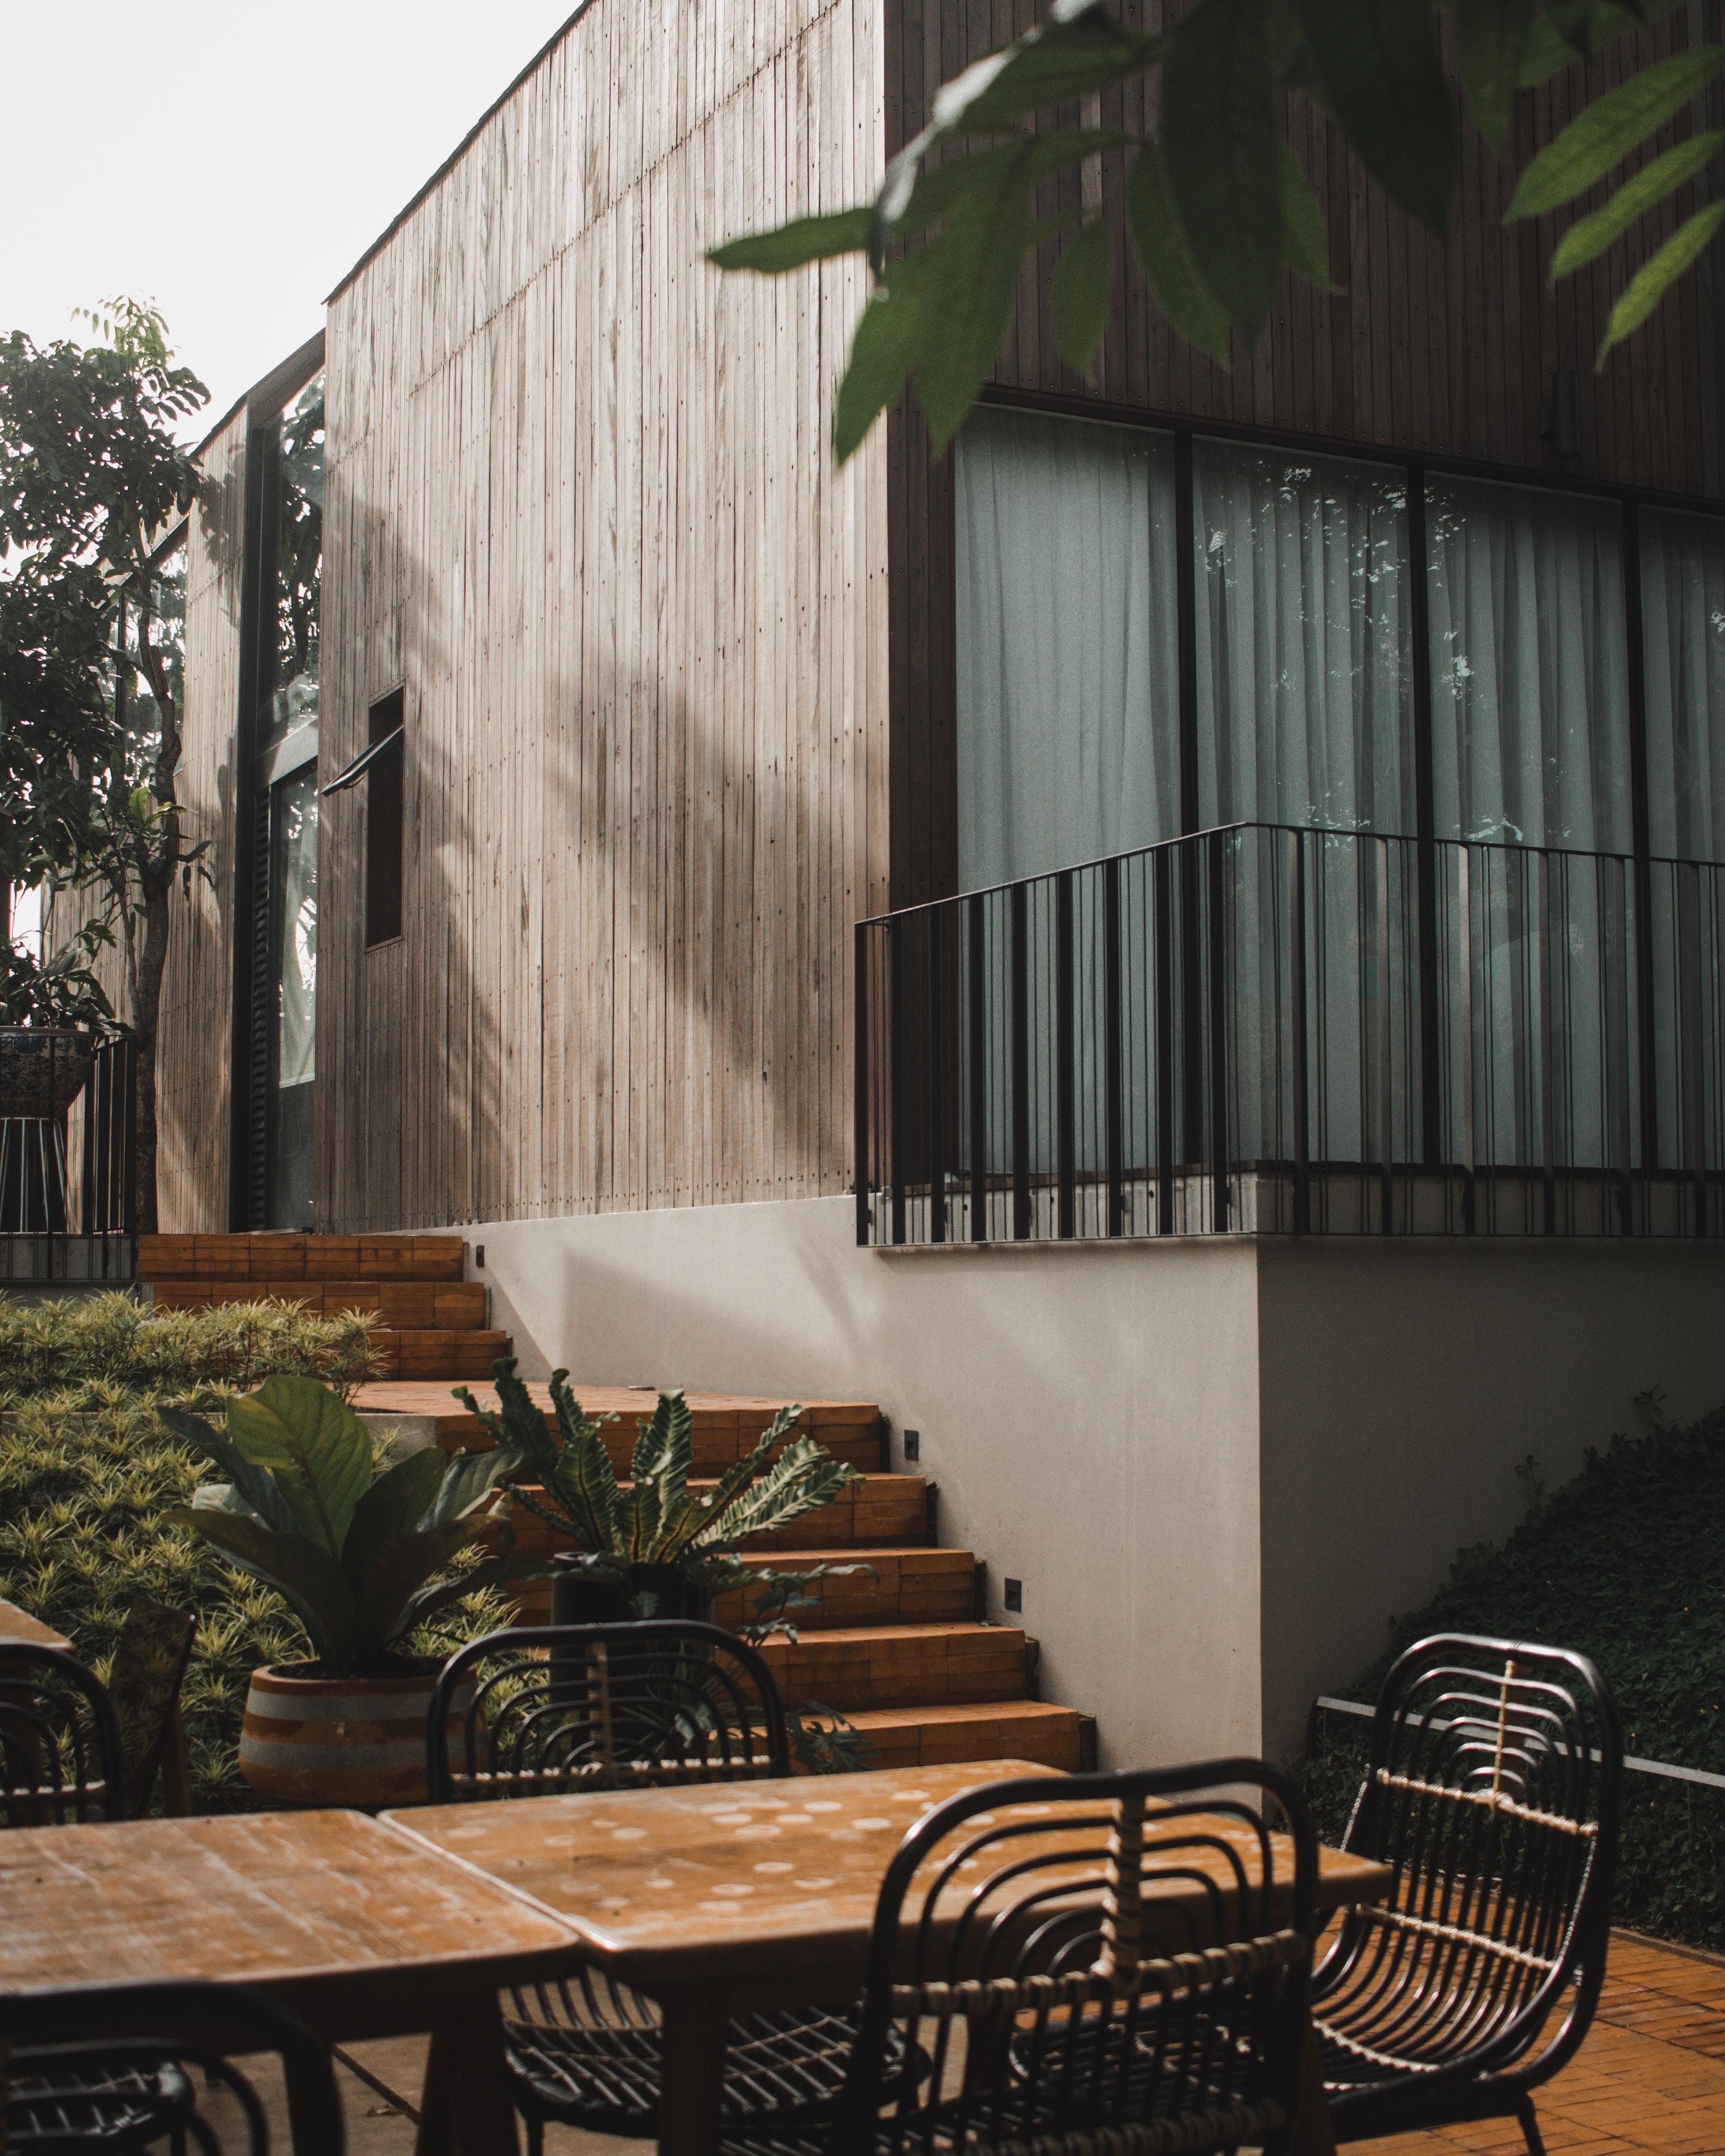 patio set near plants